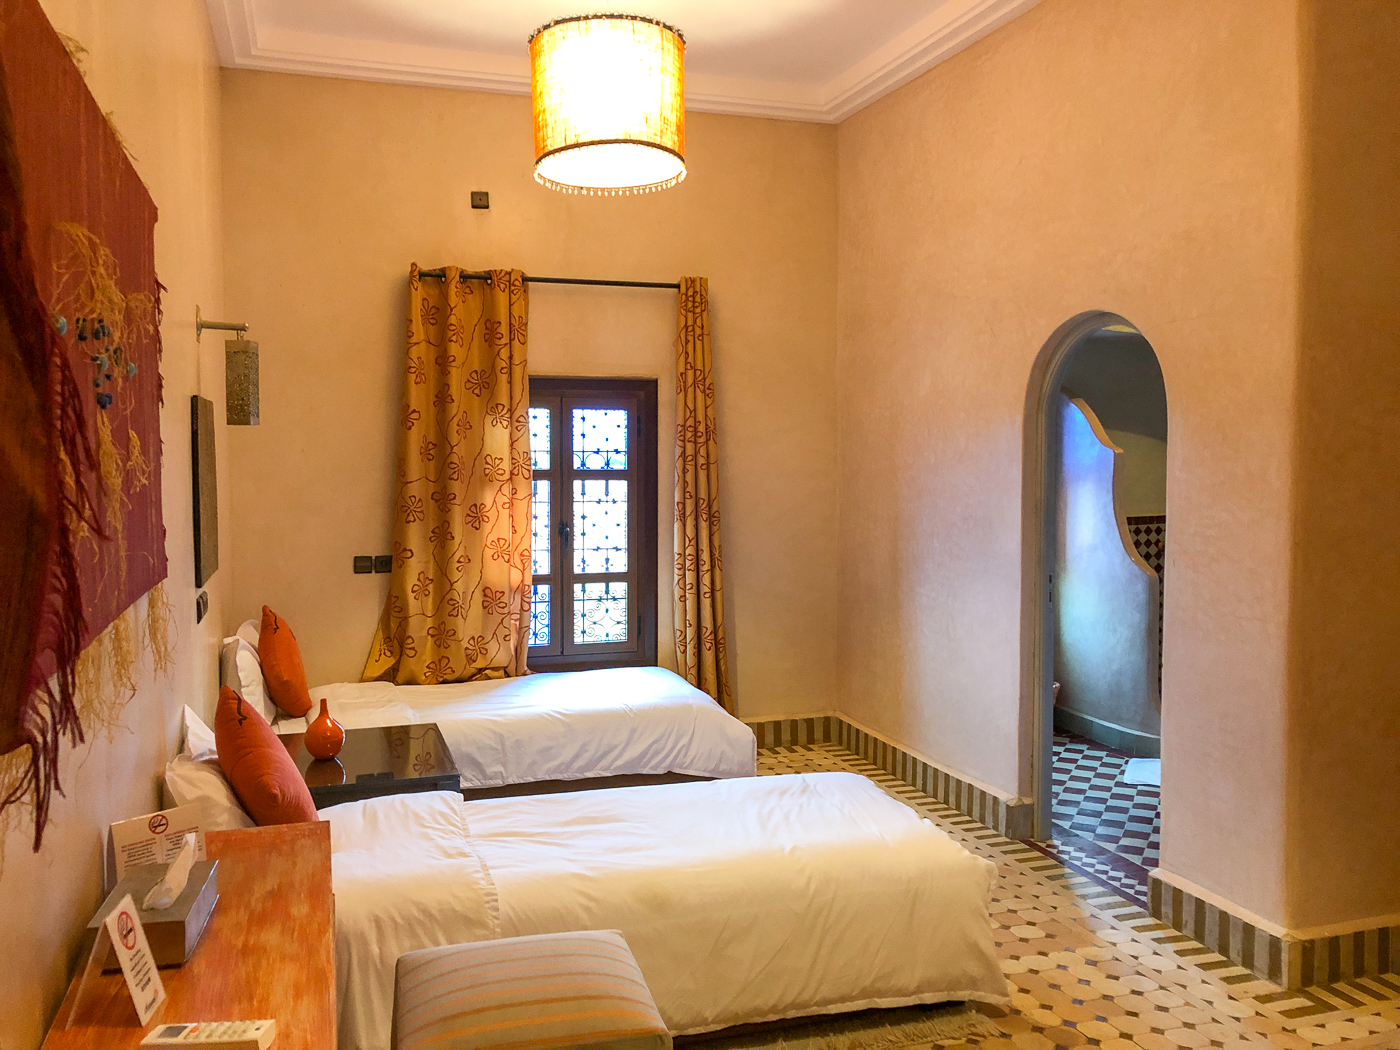 Notre chambre au Riad Azawad à Merzouga près d'Erfoud, Maroc